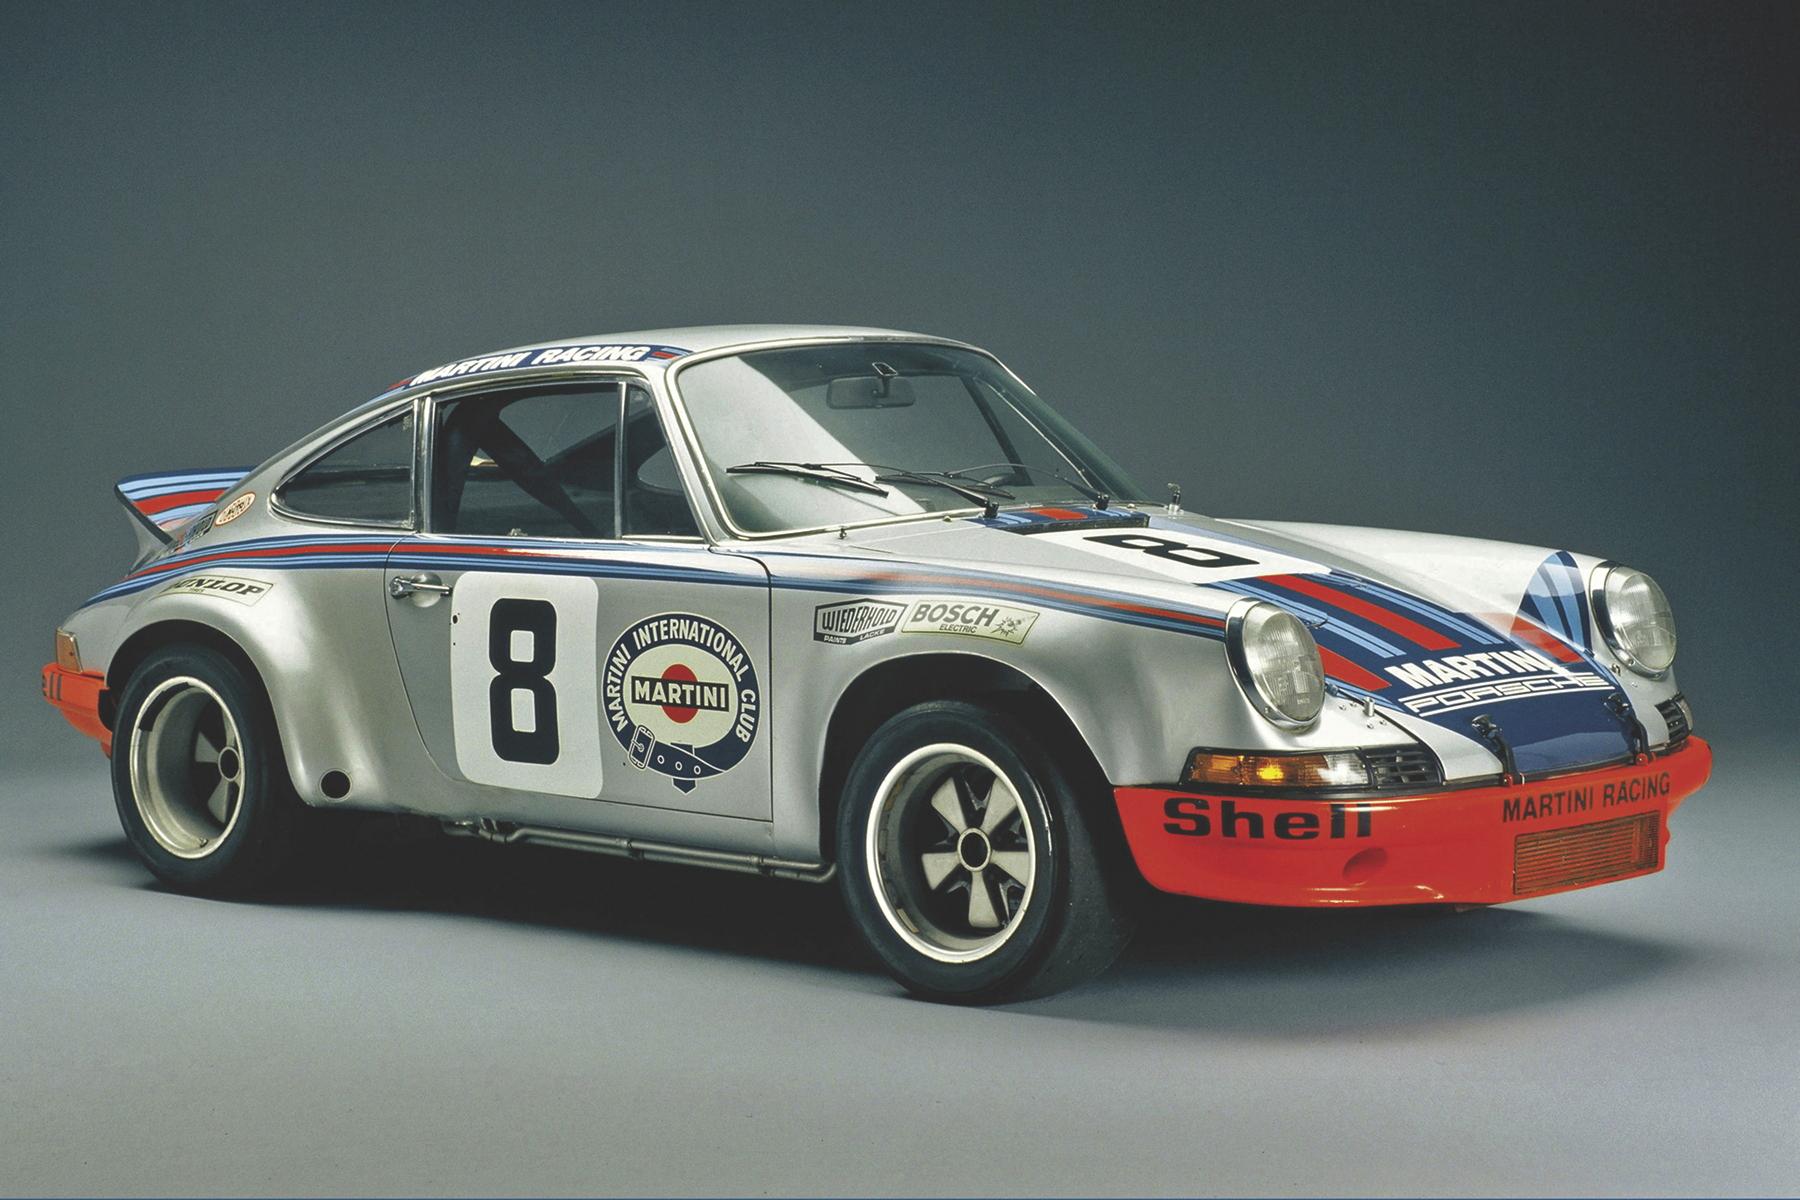 Total 911 S Top Six Porsche 911 Racing Cars Ever Built Total 911